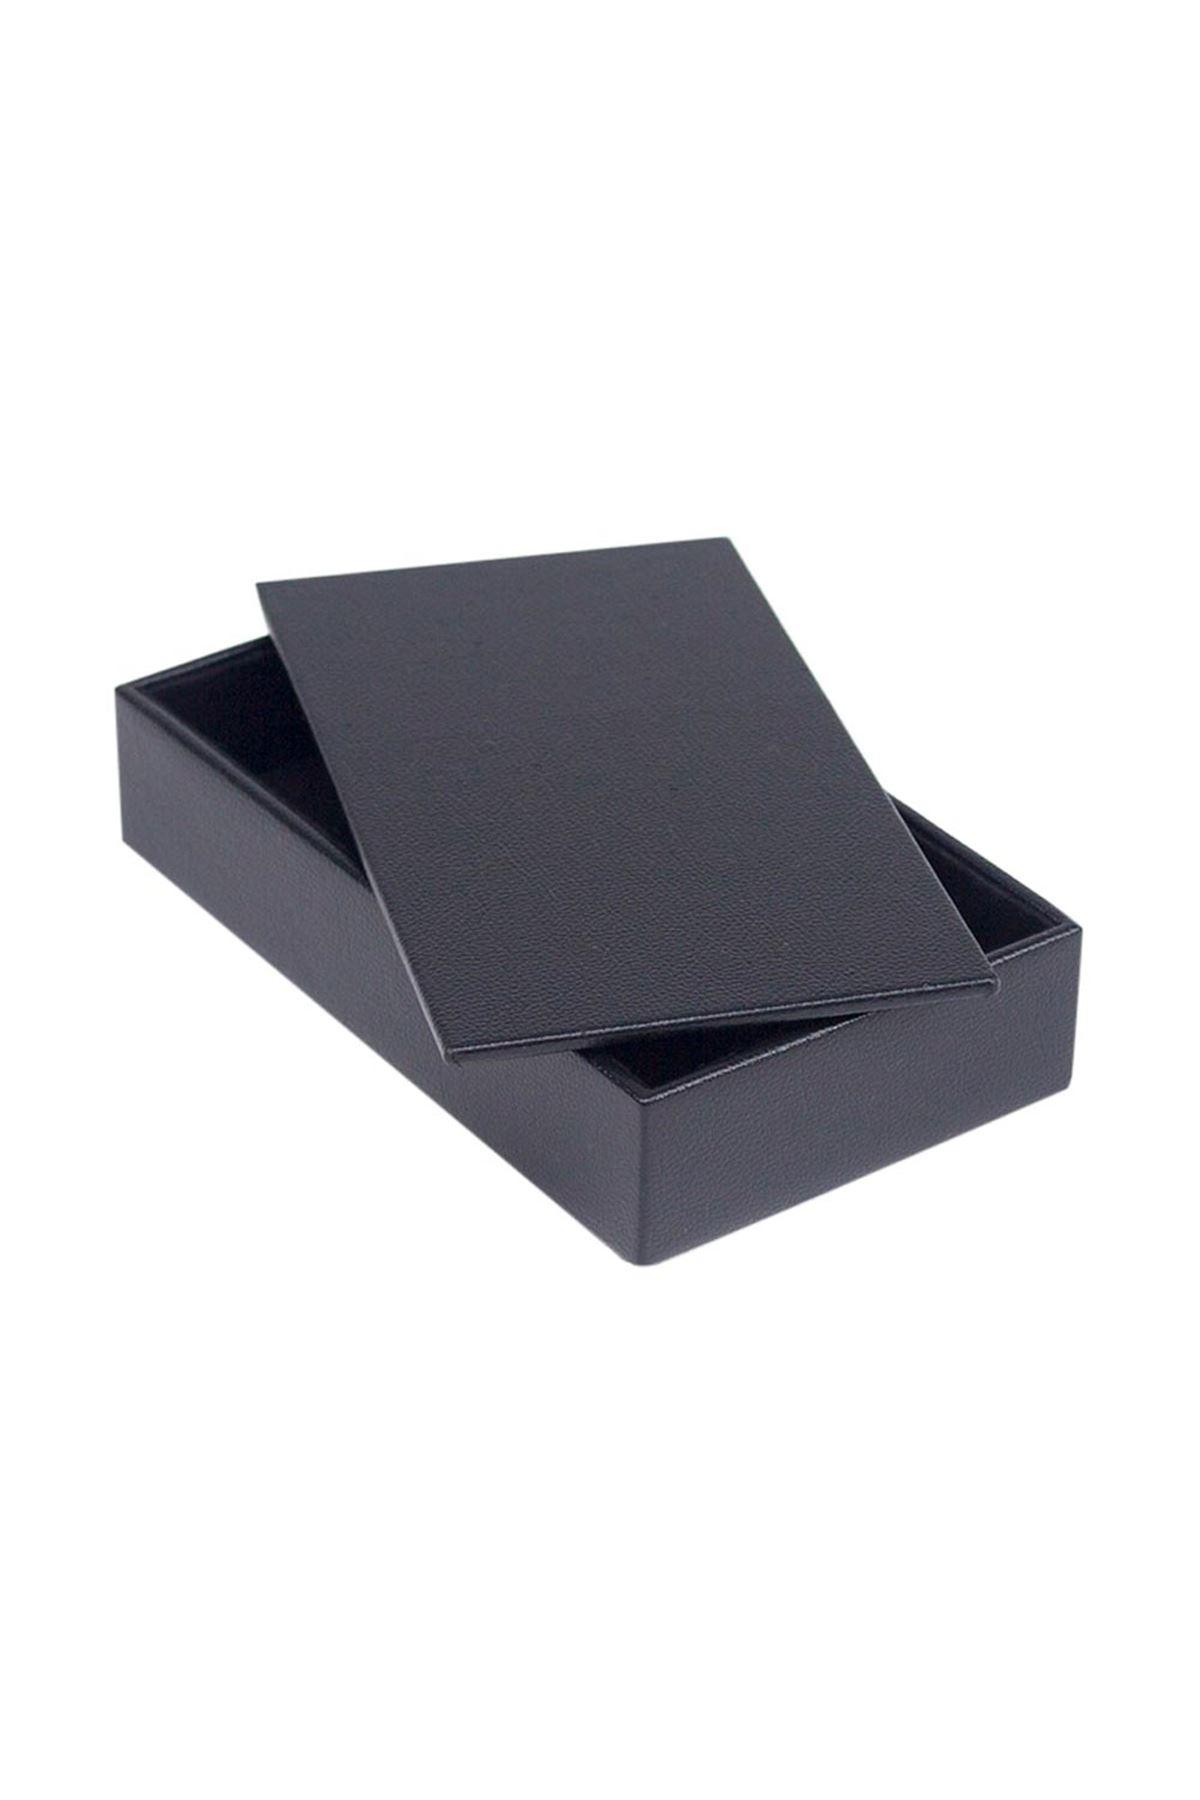 Make Your Own Desk Set Green